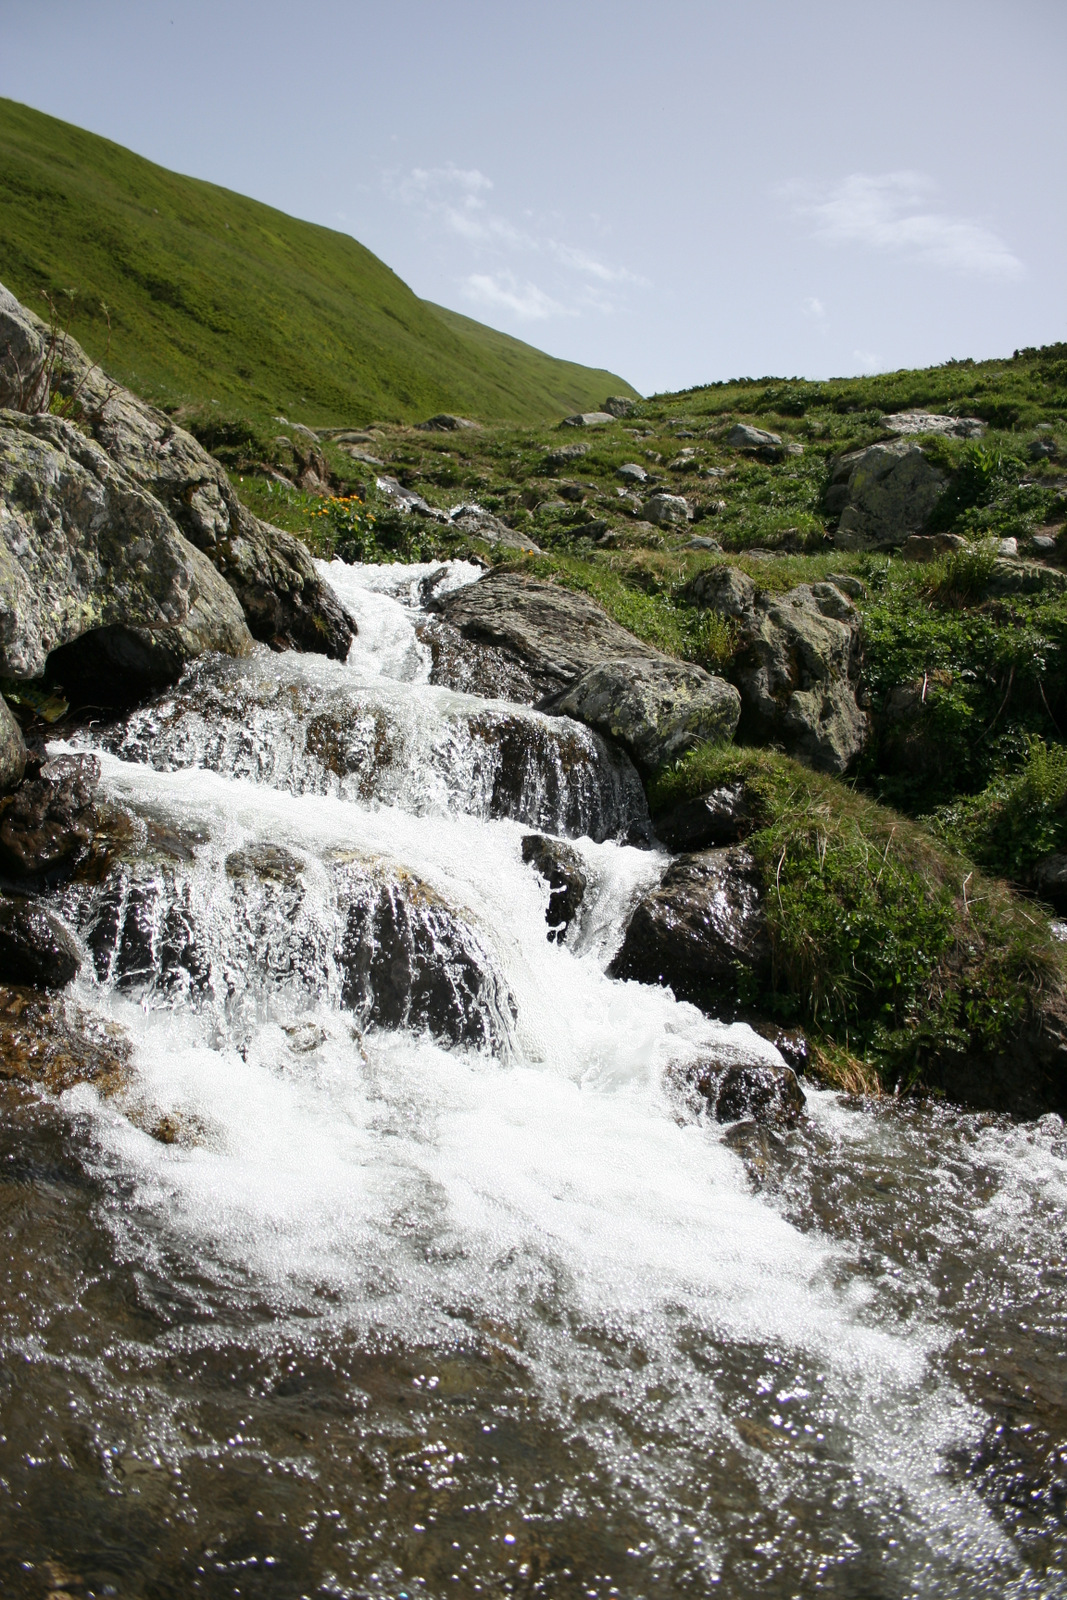 File:Kosovo Nature (8).JPG - Wikimedia Commons